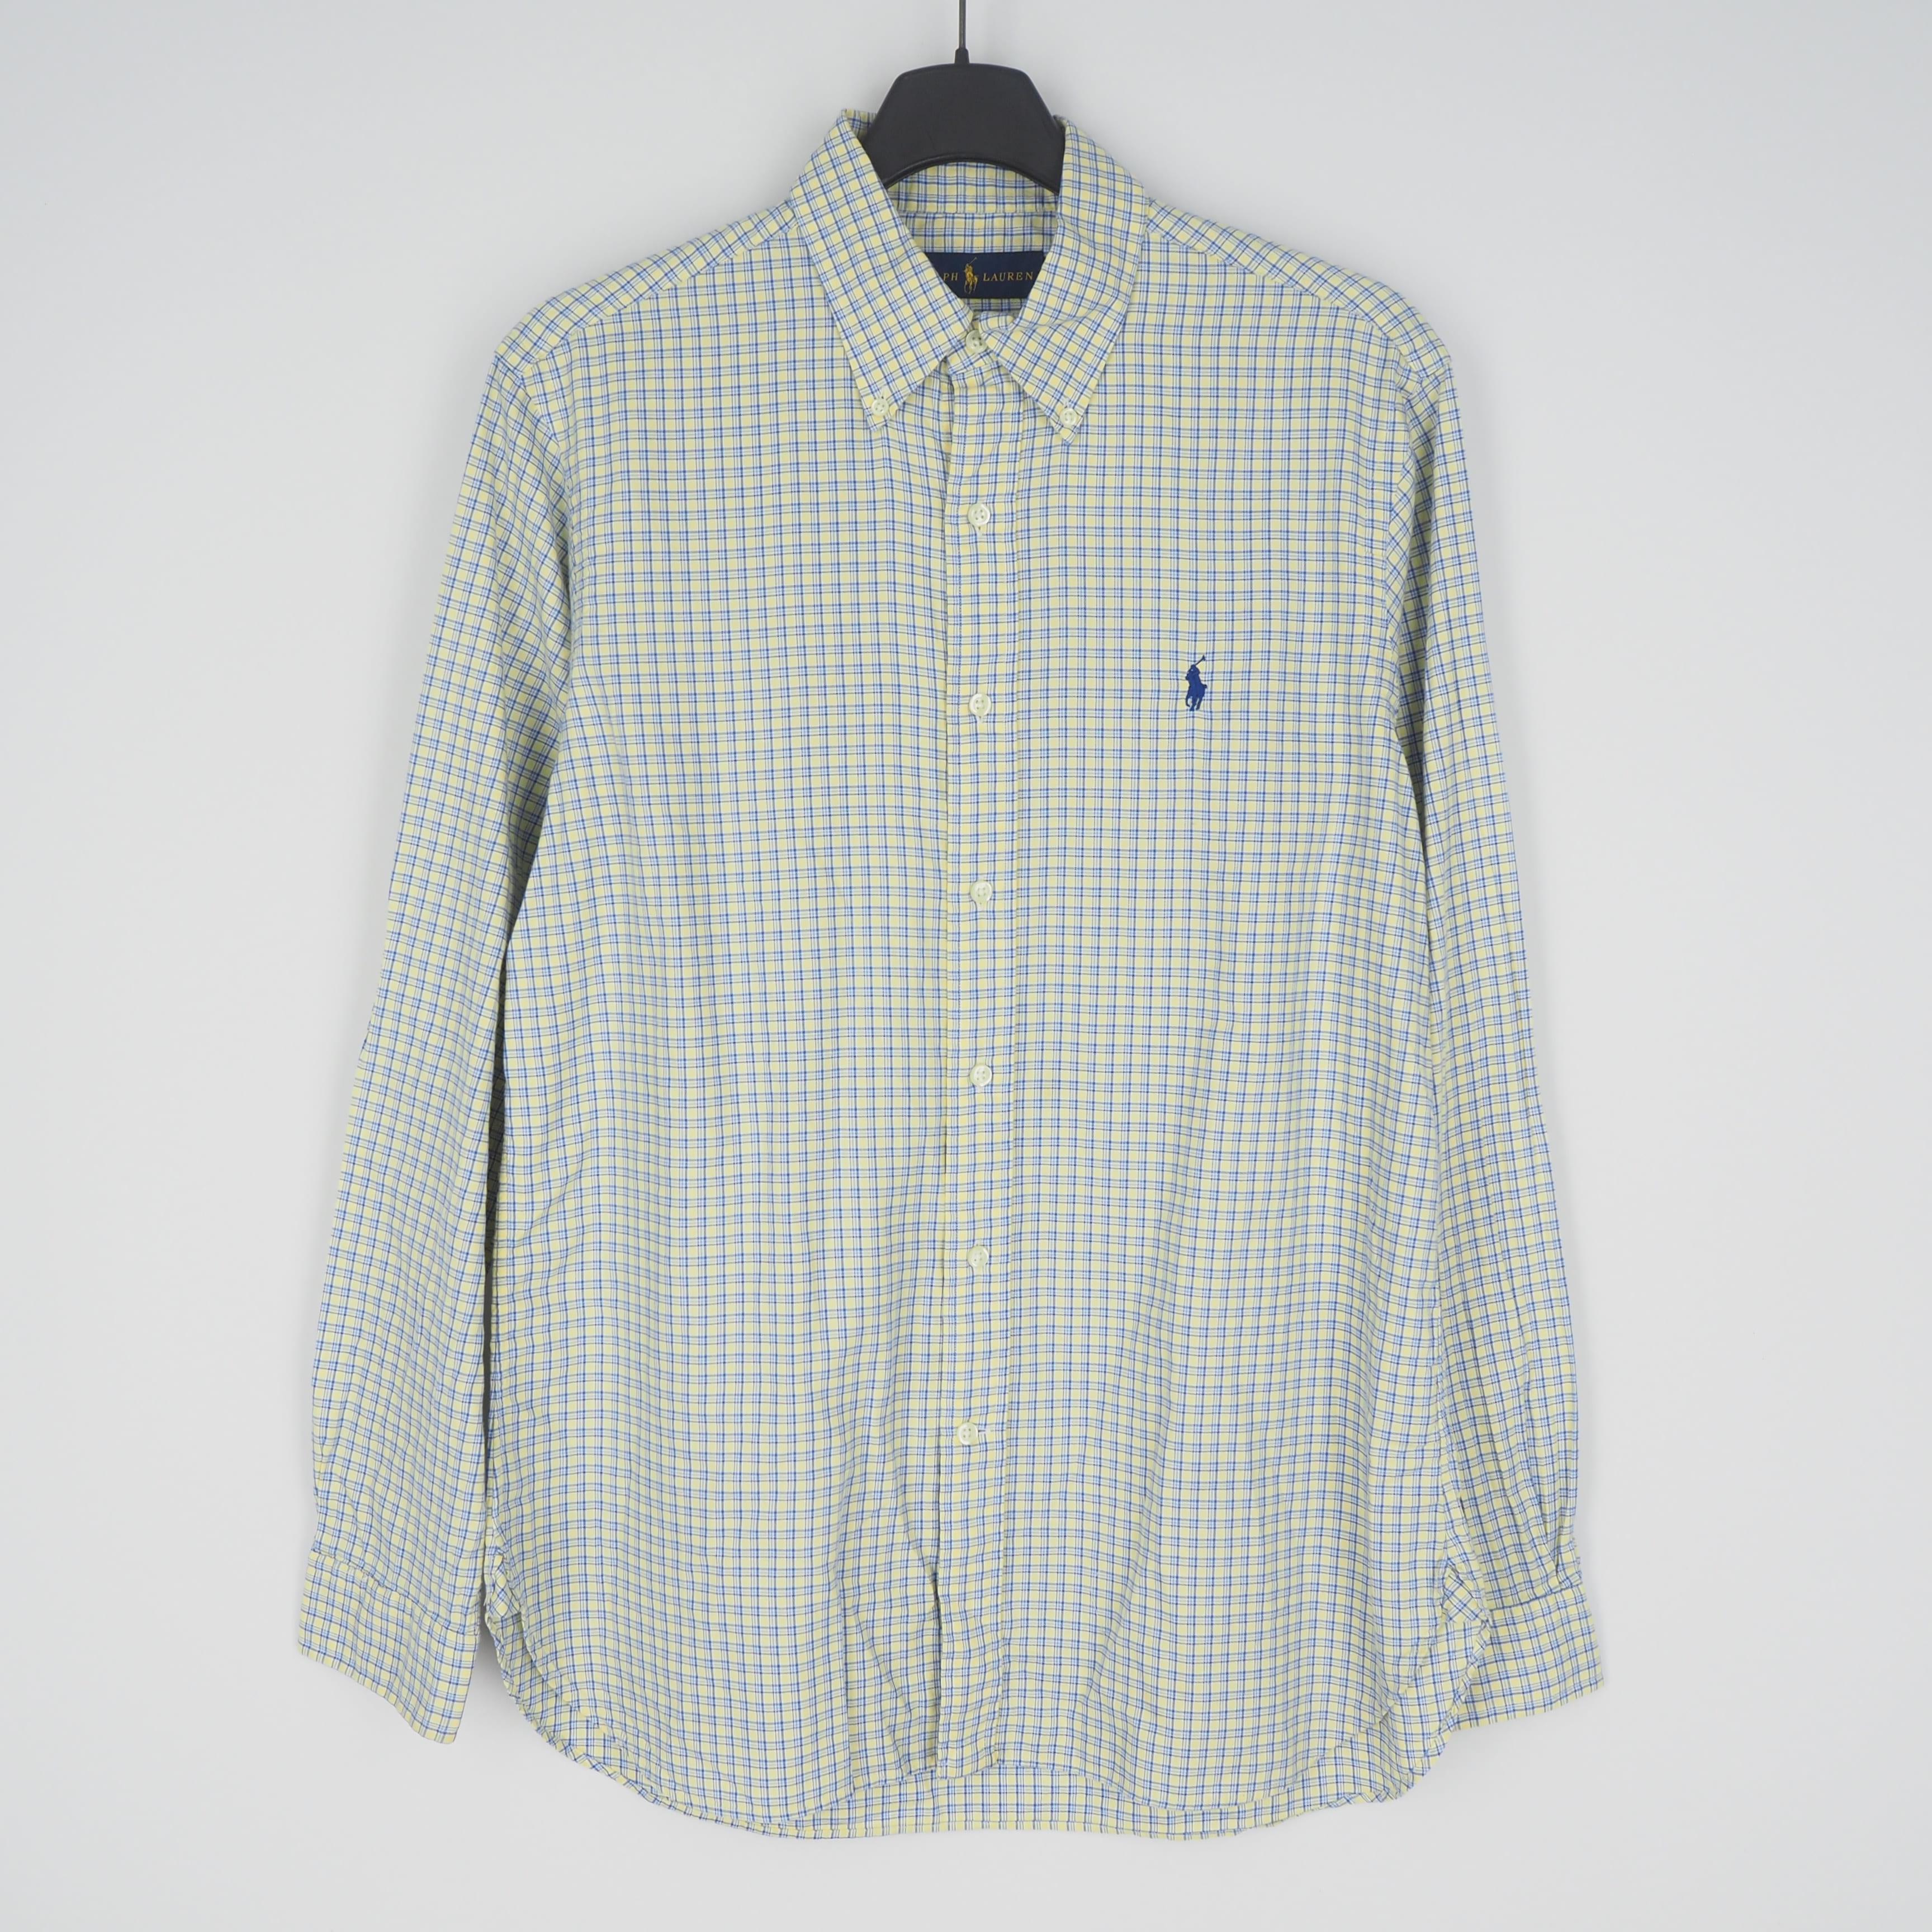 [L] 랄프로렌 긴팔 셔츠